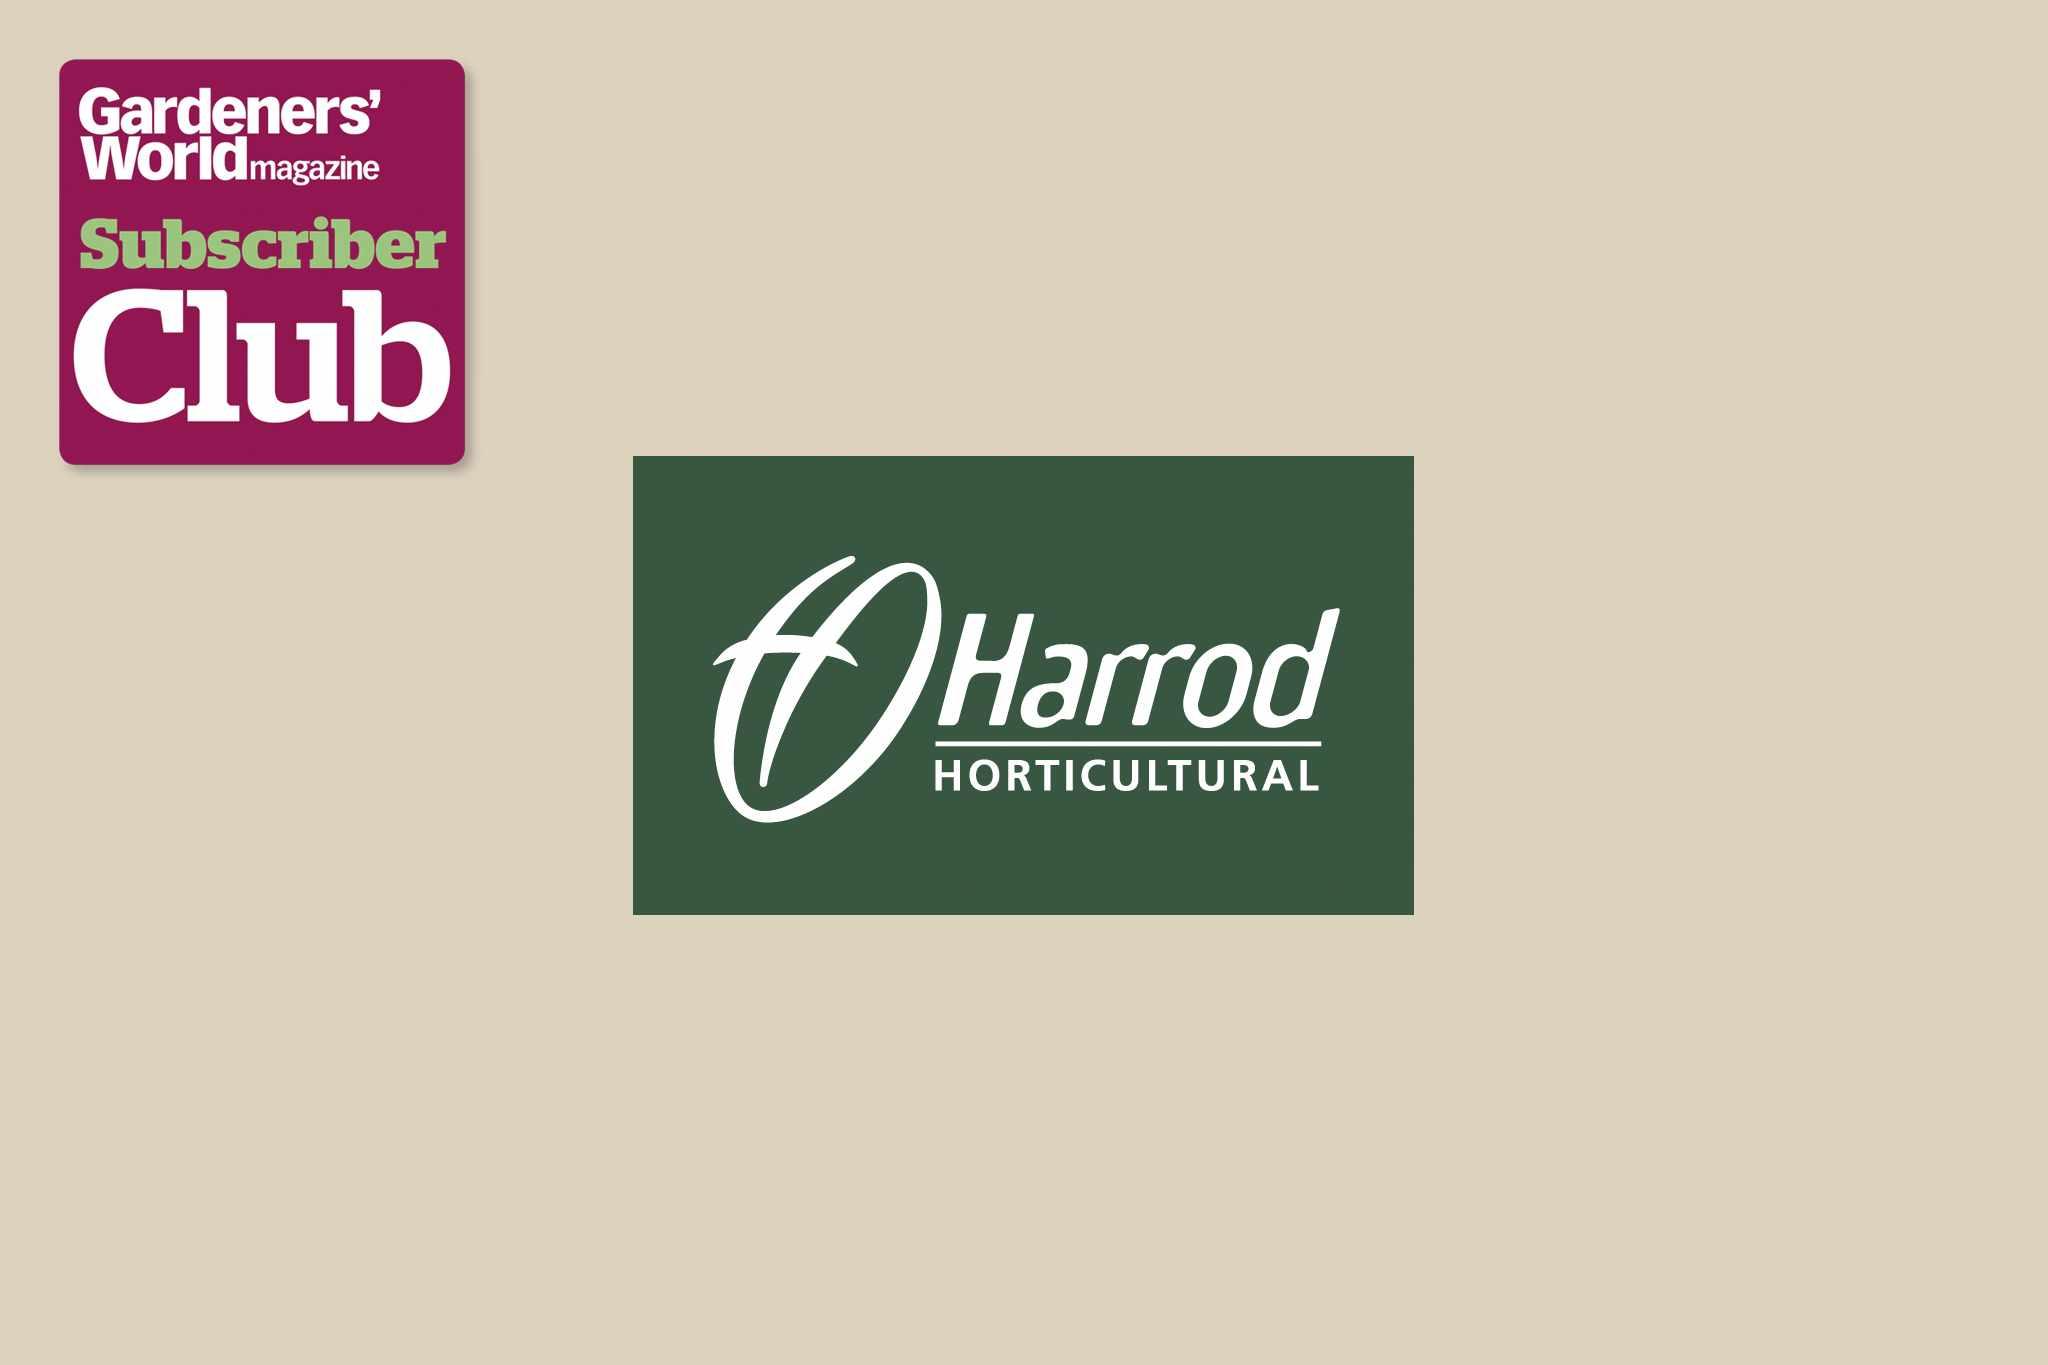 Harrod Horticultural BBC Gardeners' World Magazine Subscriber Club discount